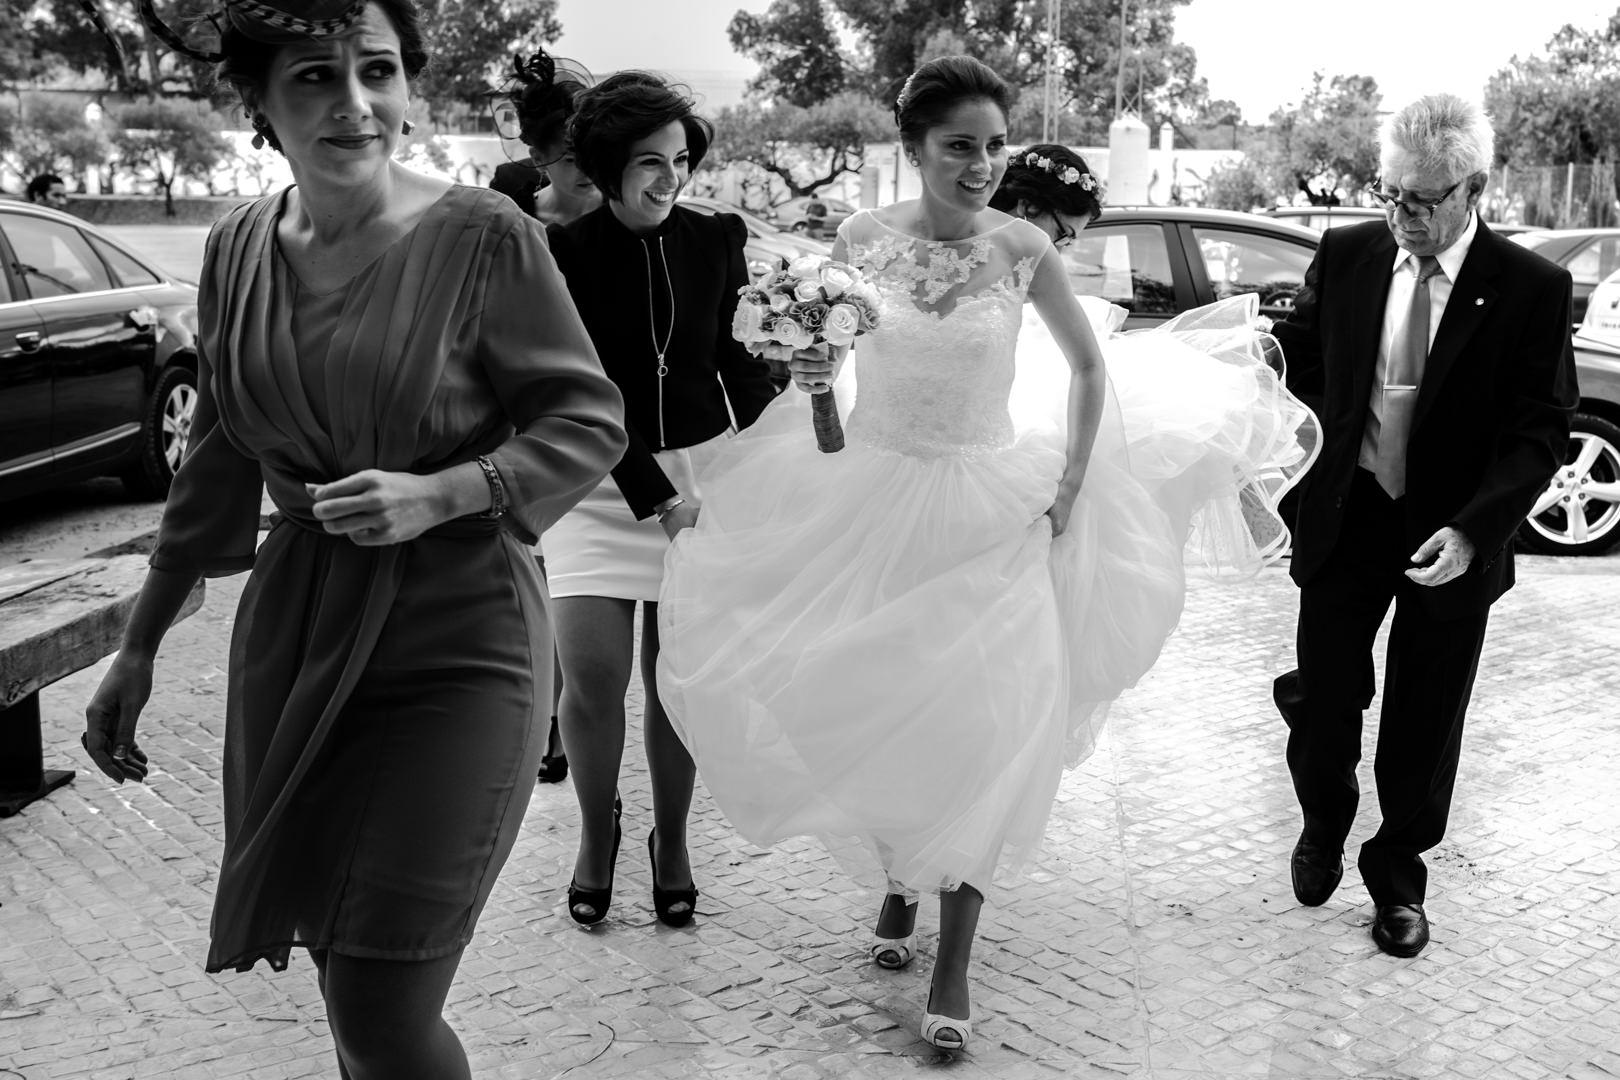 Boda-Hacienda-LOrigen-Pepe-Maria-engagement-Rafael-Torres-fotografo-bodas-sevilla-madrid-barcelona-wedding-photographer--17.jpg